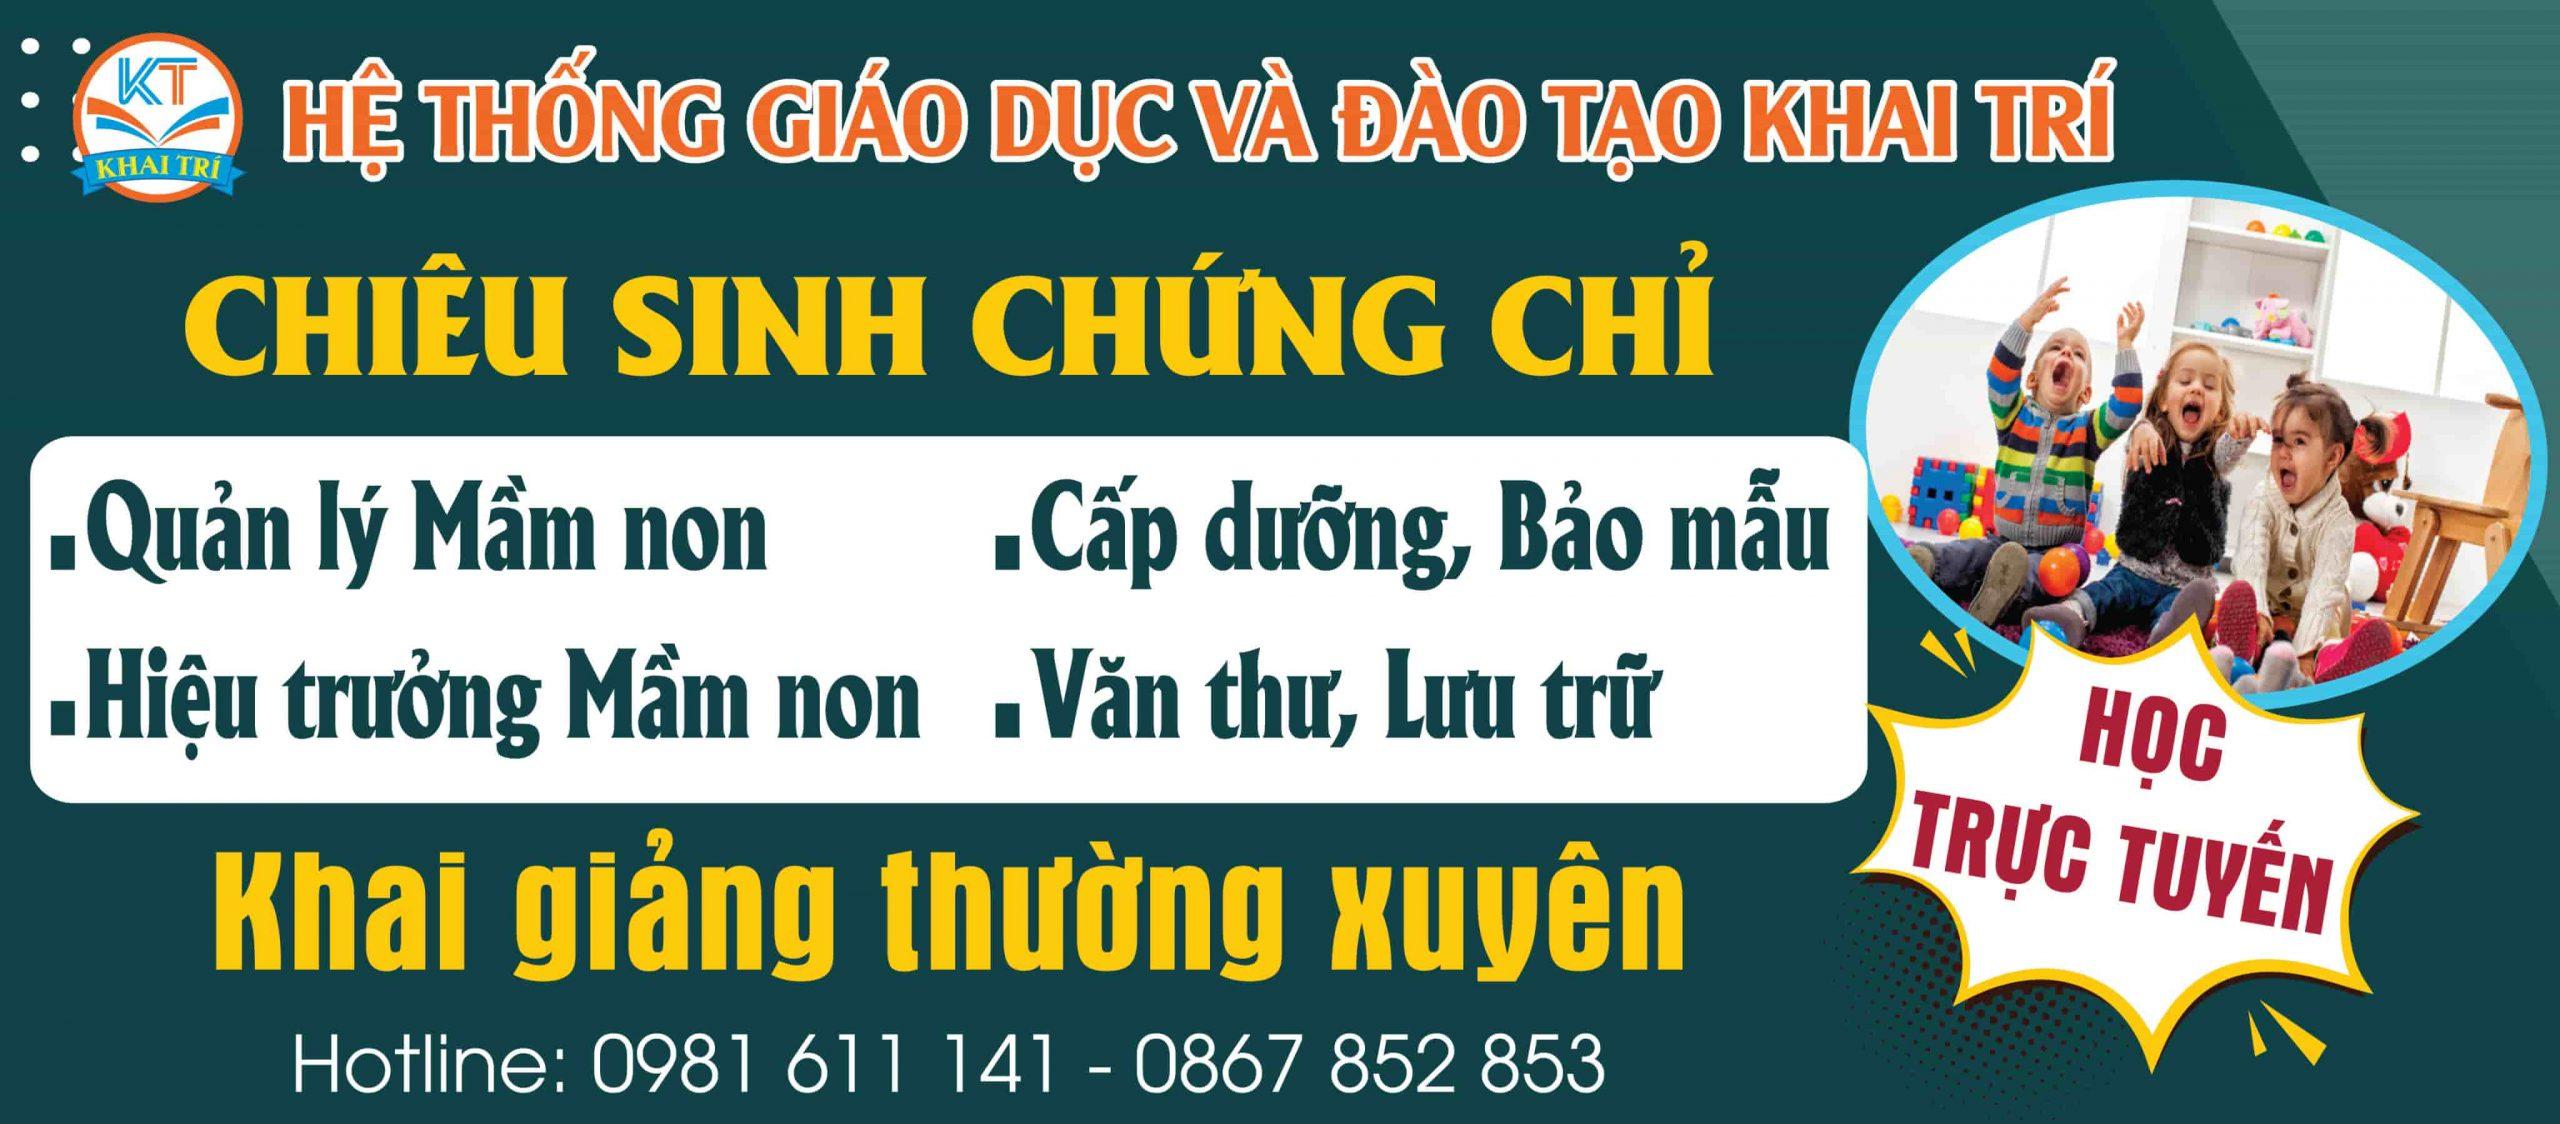 ChieuSinhChungChi_28.08.2021_banne